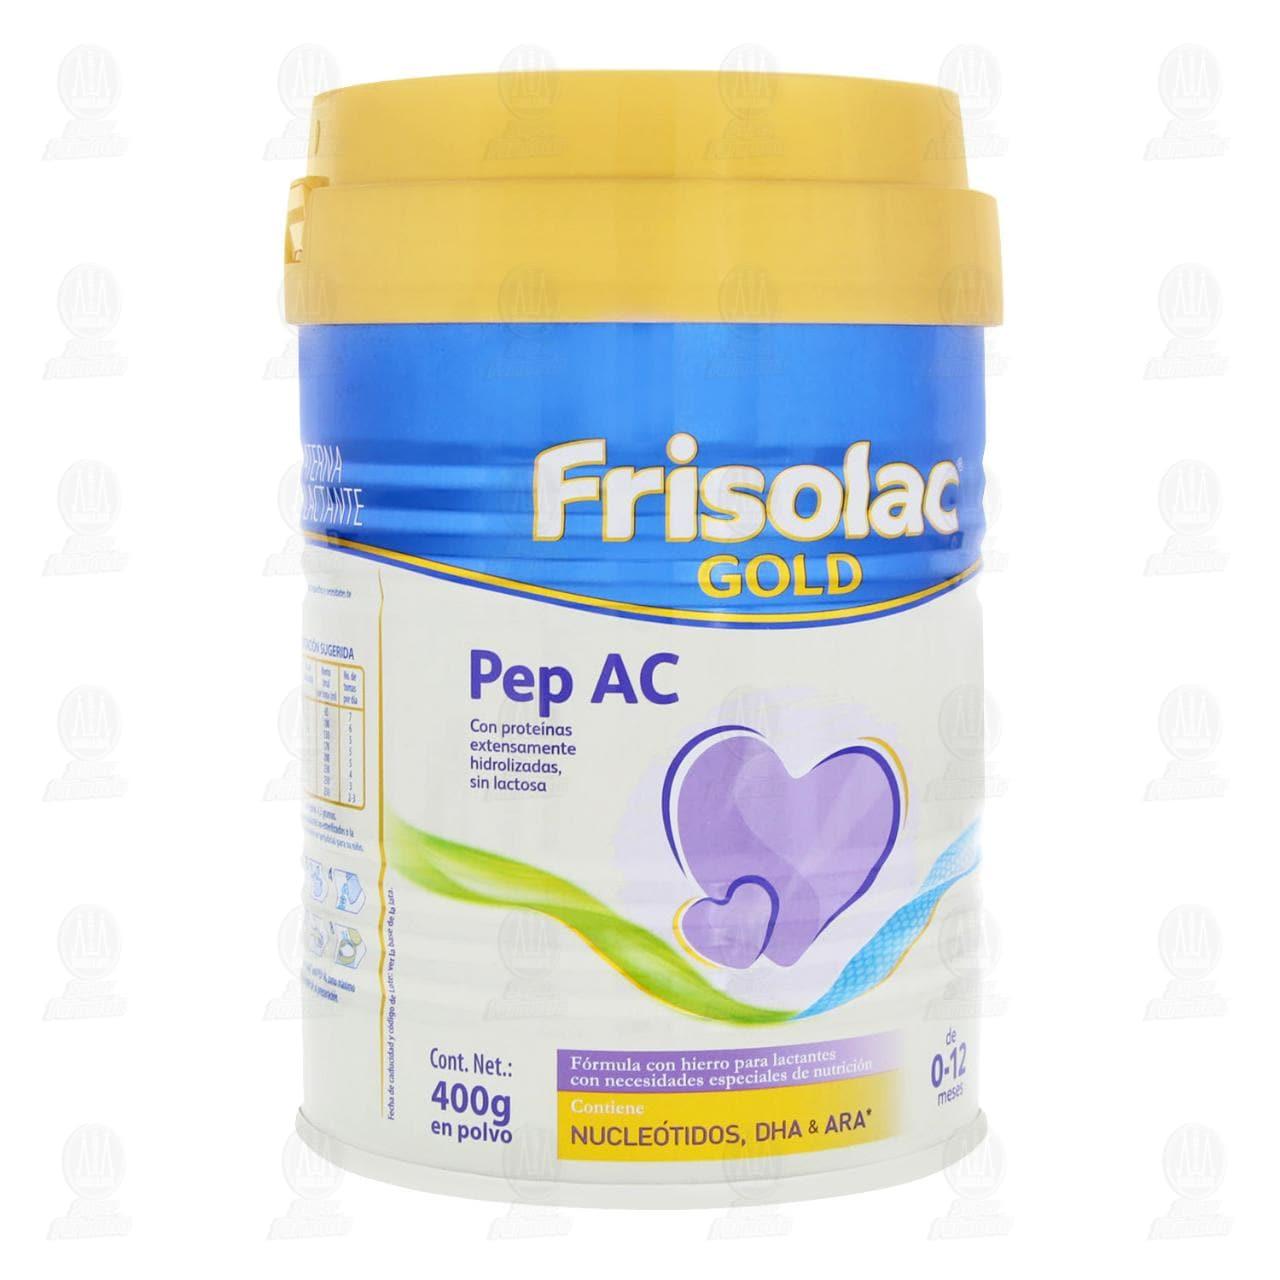 Comprar Fórmula Infantil Frisolac Gold Pep AC en Polvo (Edad 0-12 Meses), 400 gr. en Farmacias Guadalajara